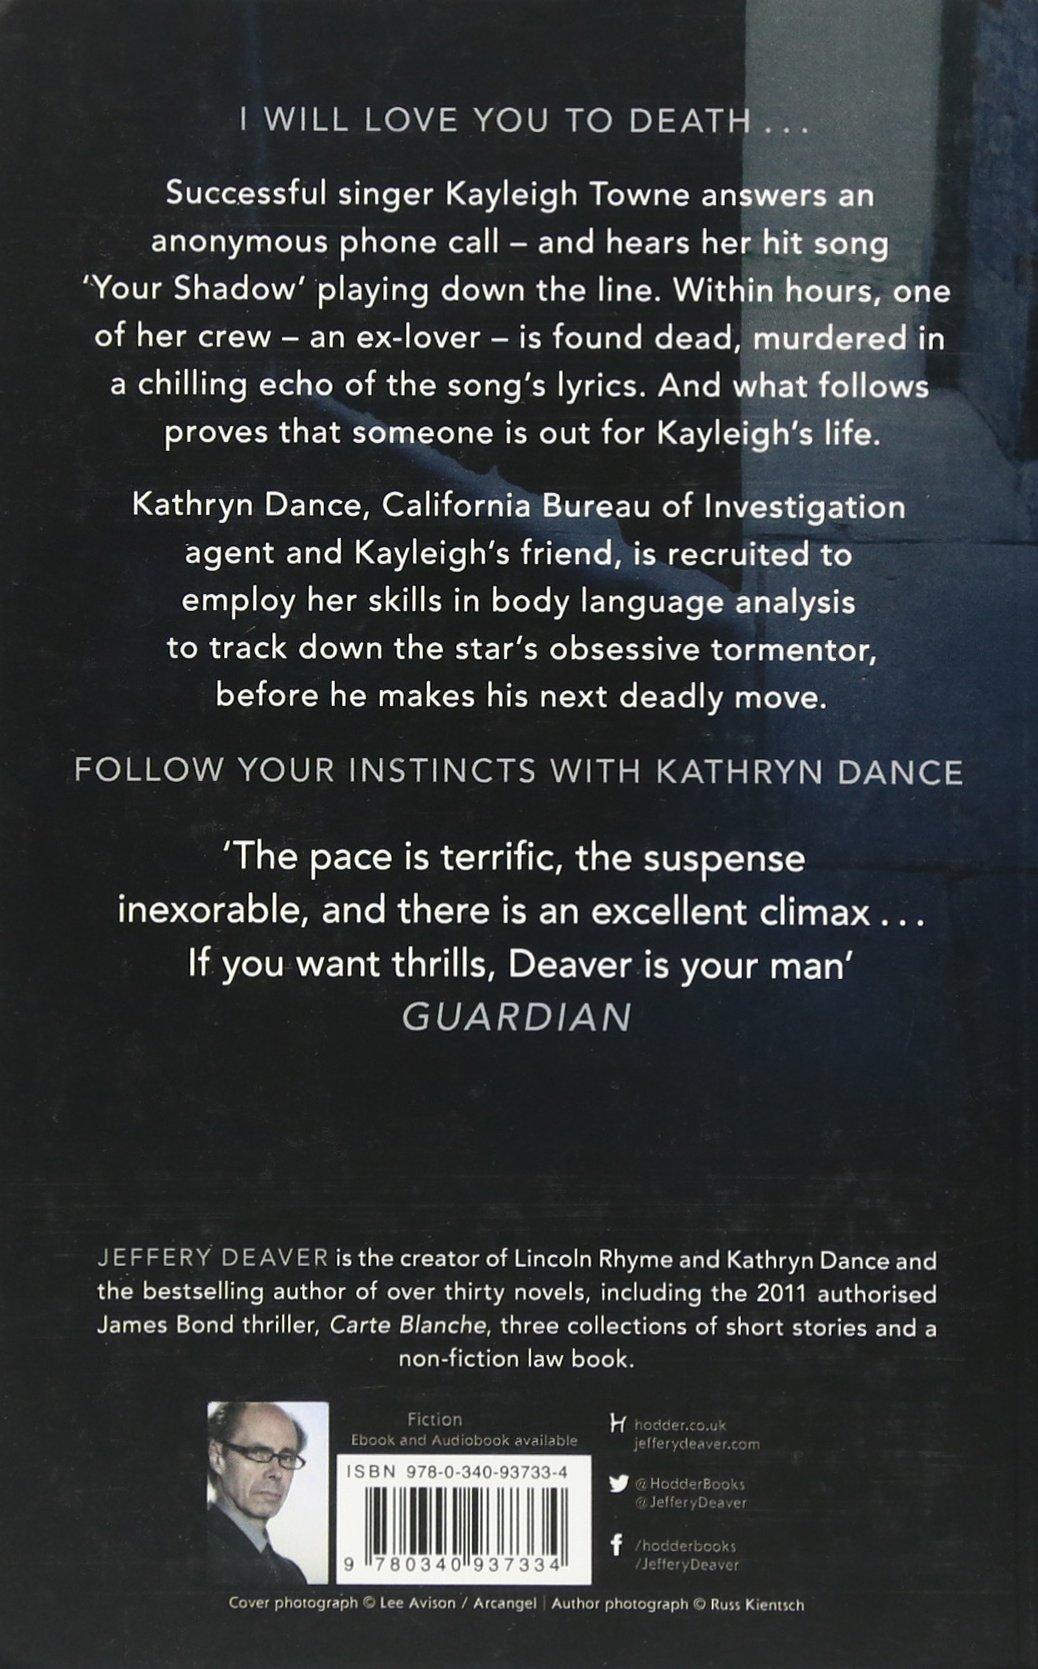 XO: A Kathryn Dance Thriller (Kathryn Dance thrillers): Amazon.co.uk:  Jeffery Deaver: 9780340937334: Books